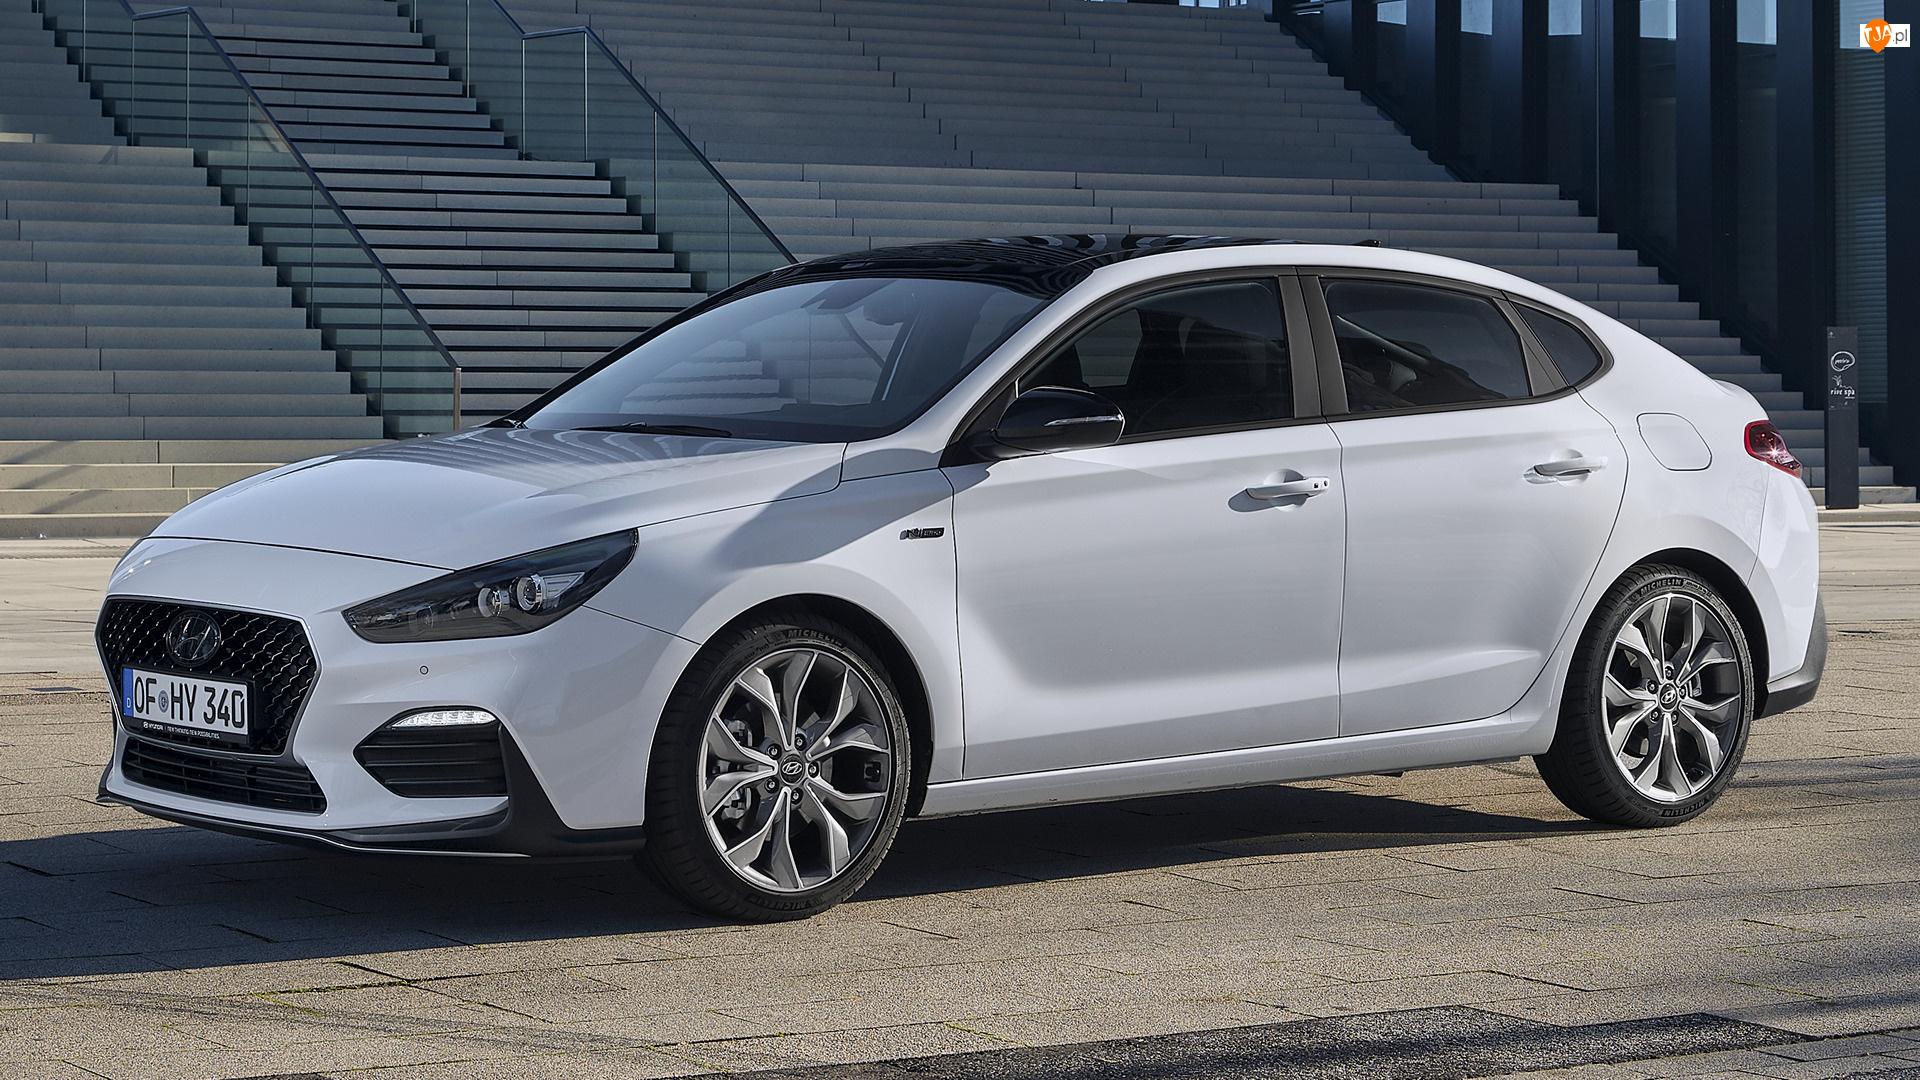 Bok, Biały, Hyundai i30